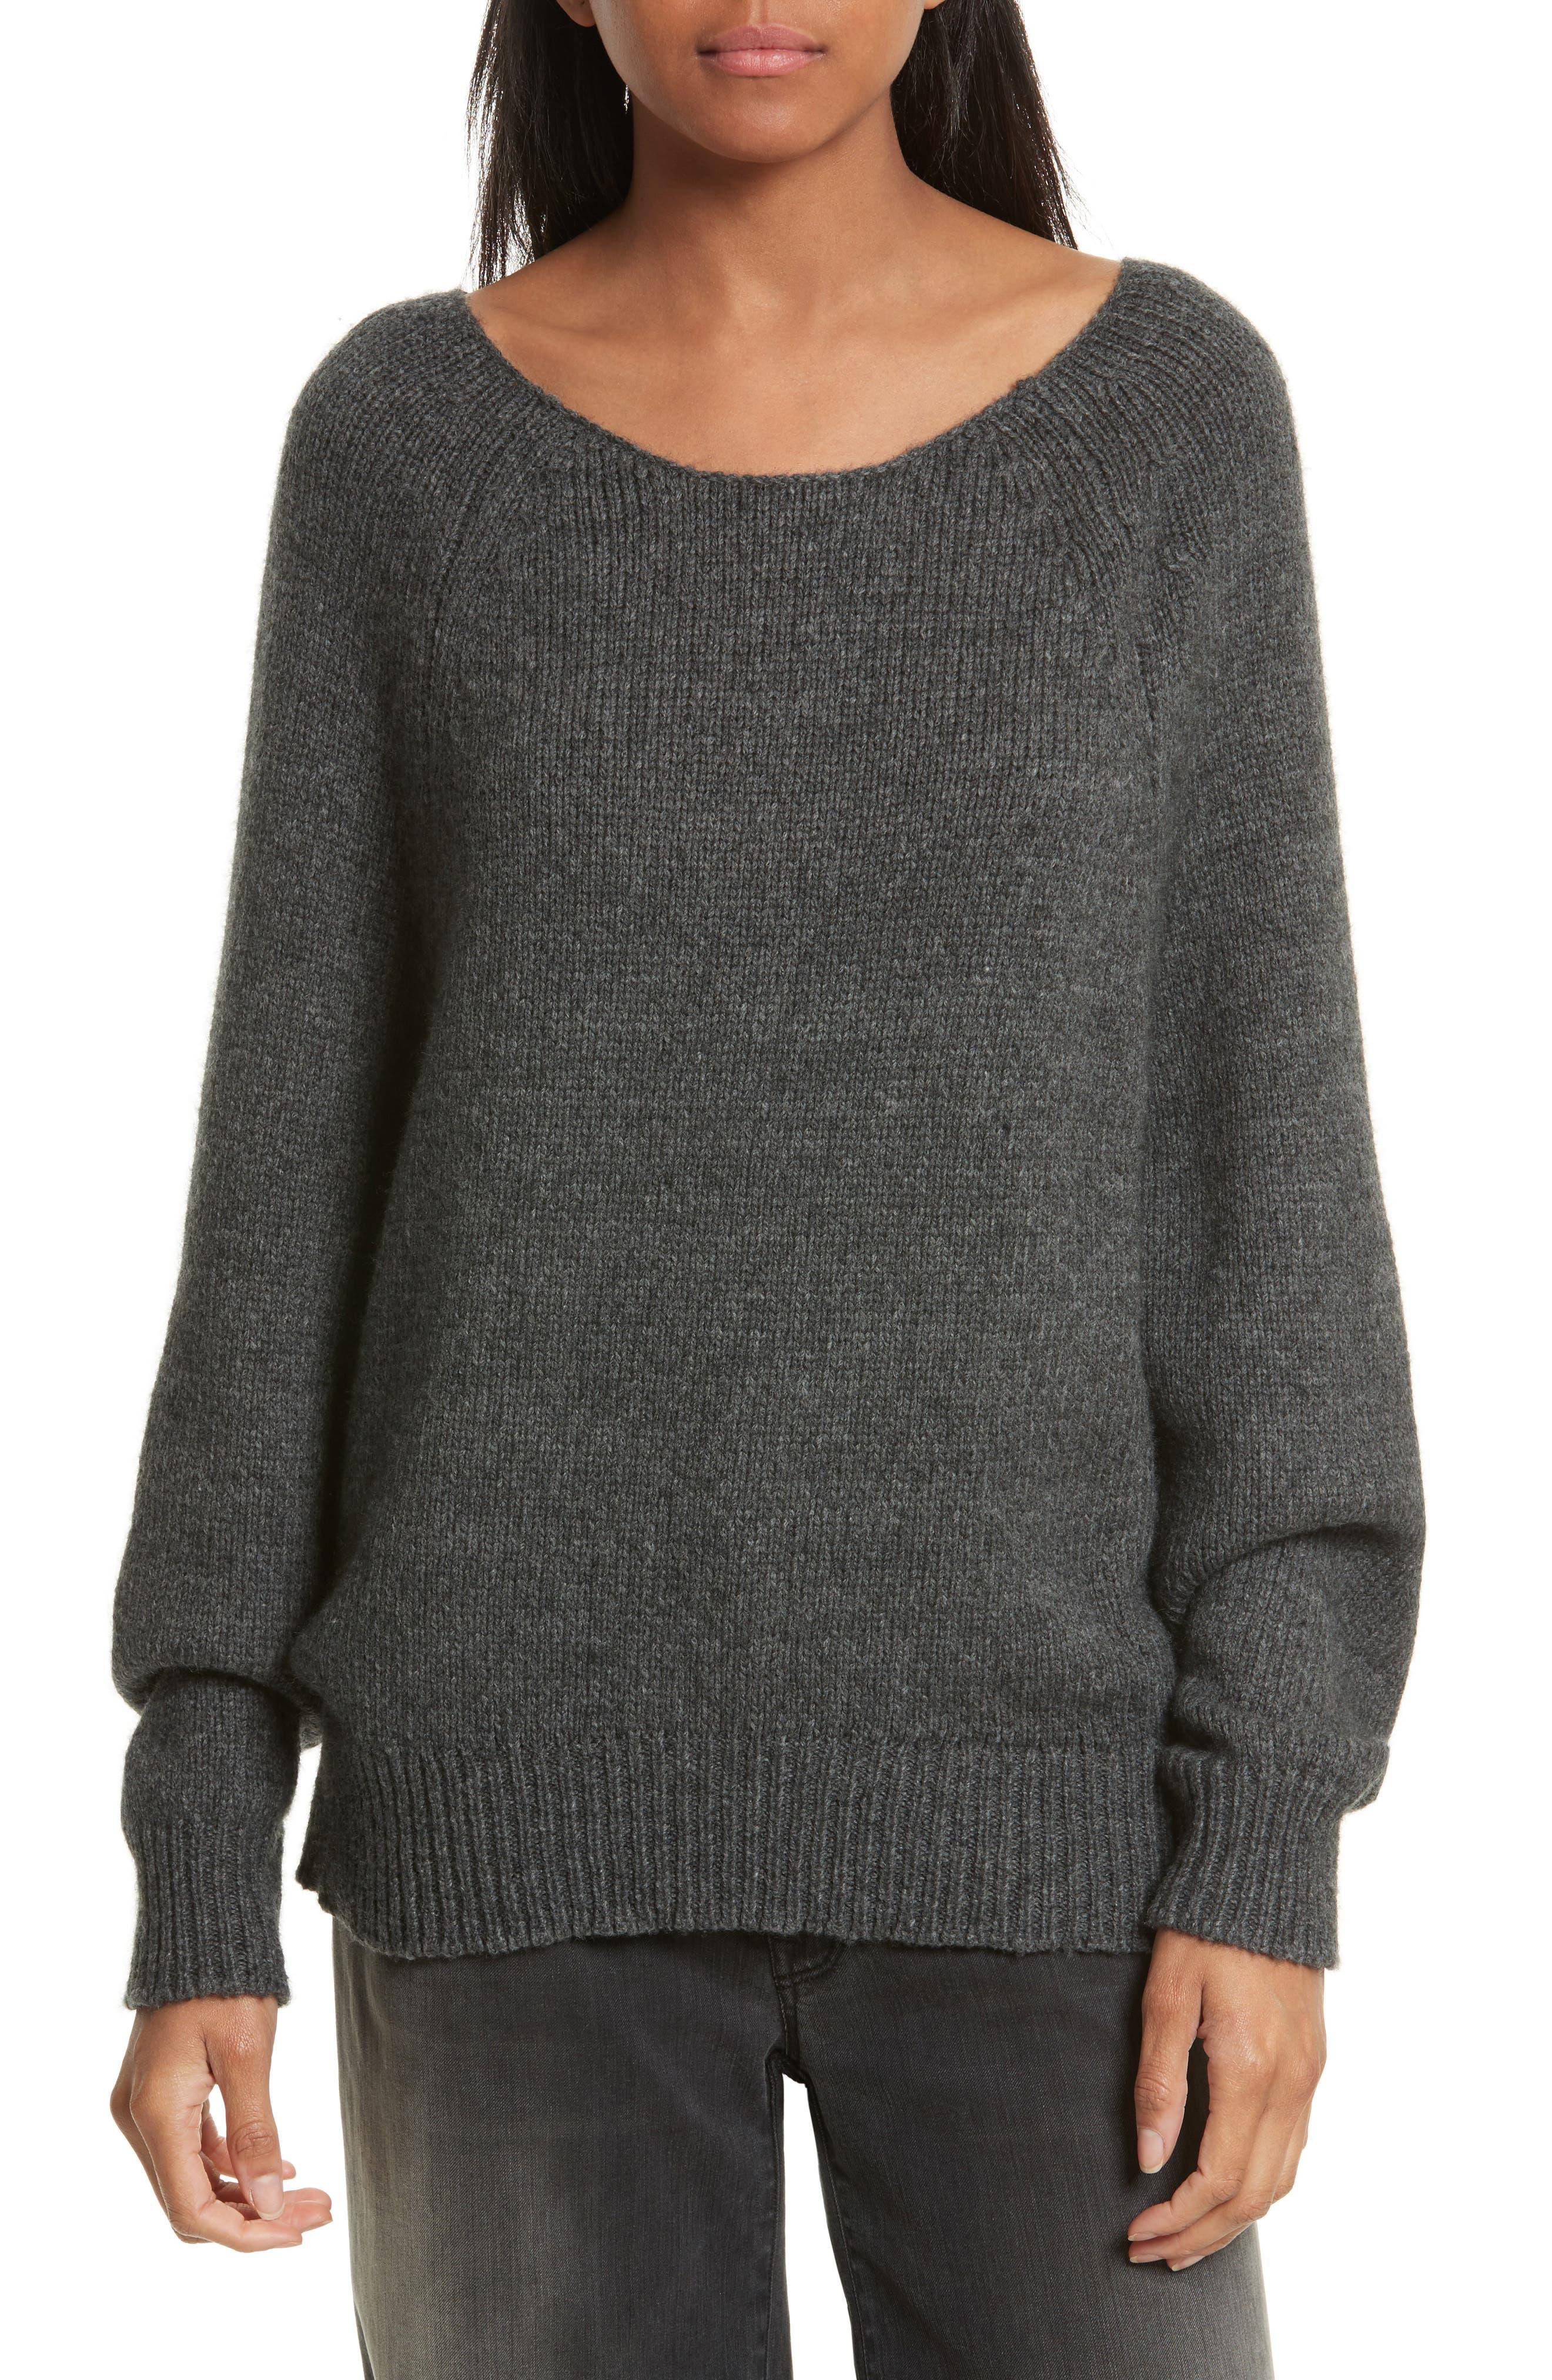 Nili Lotan Casper Merino Wool Blend Sweater